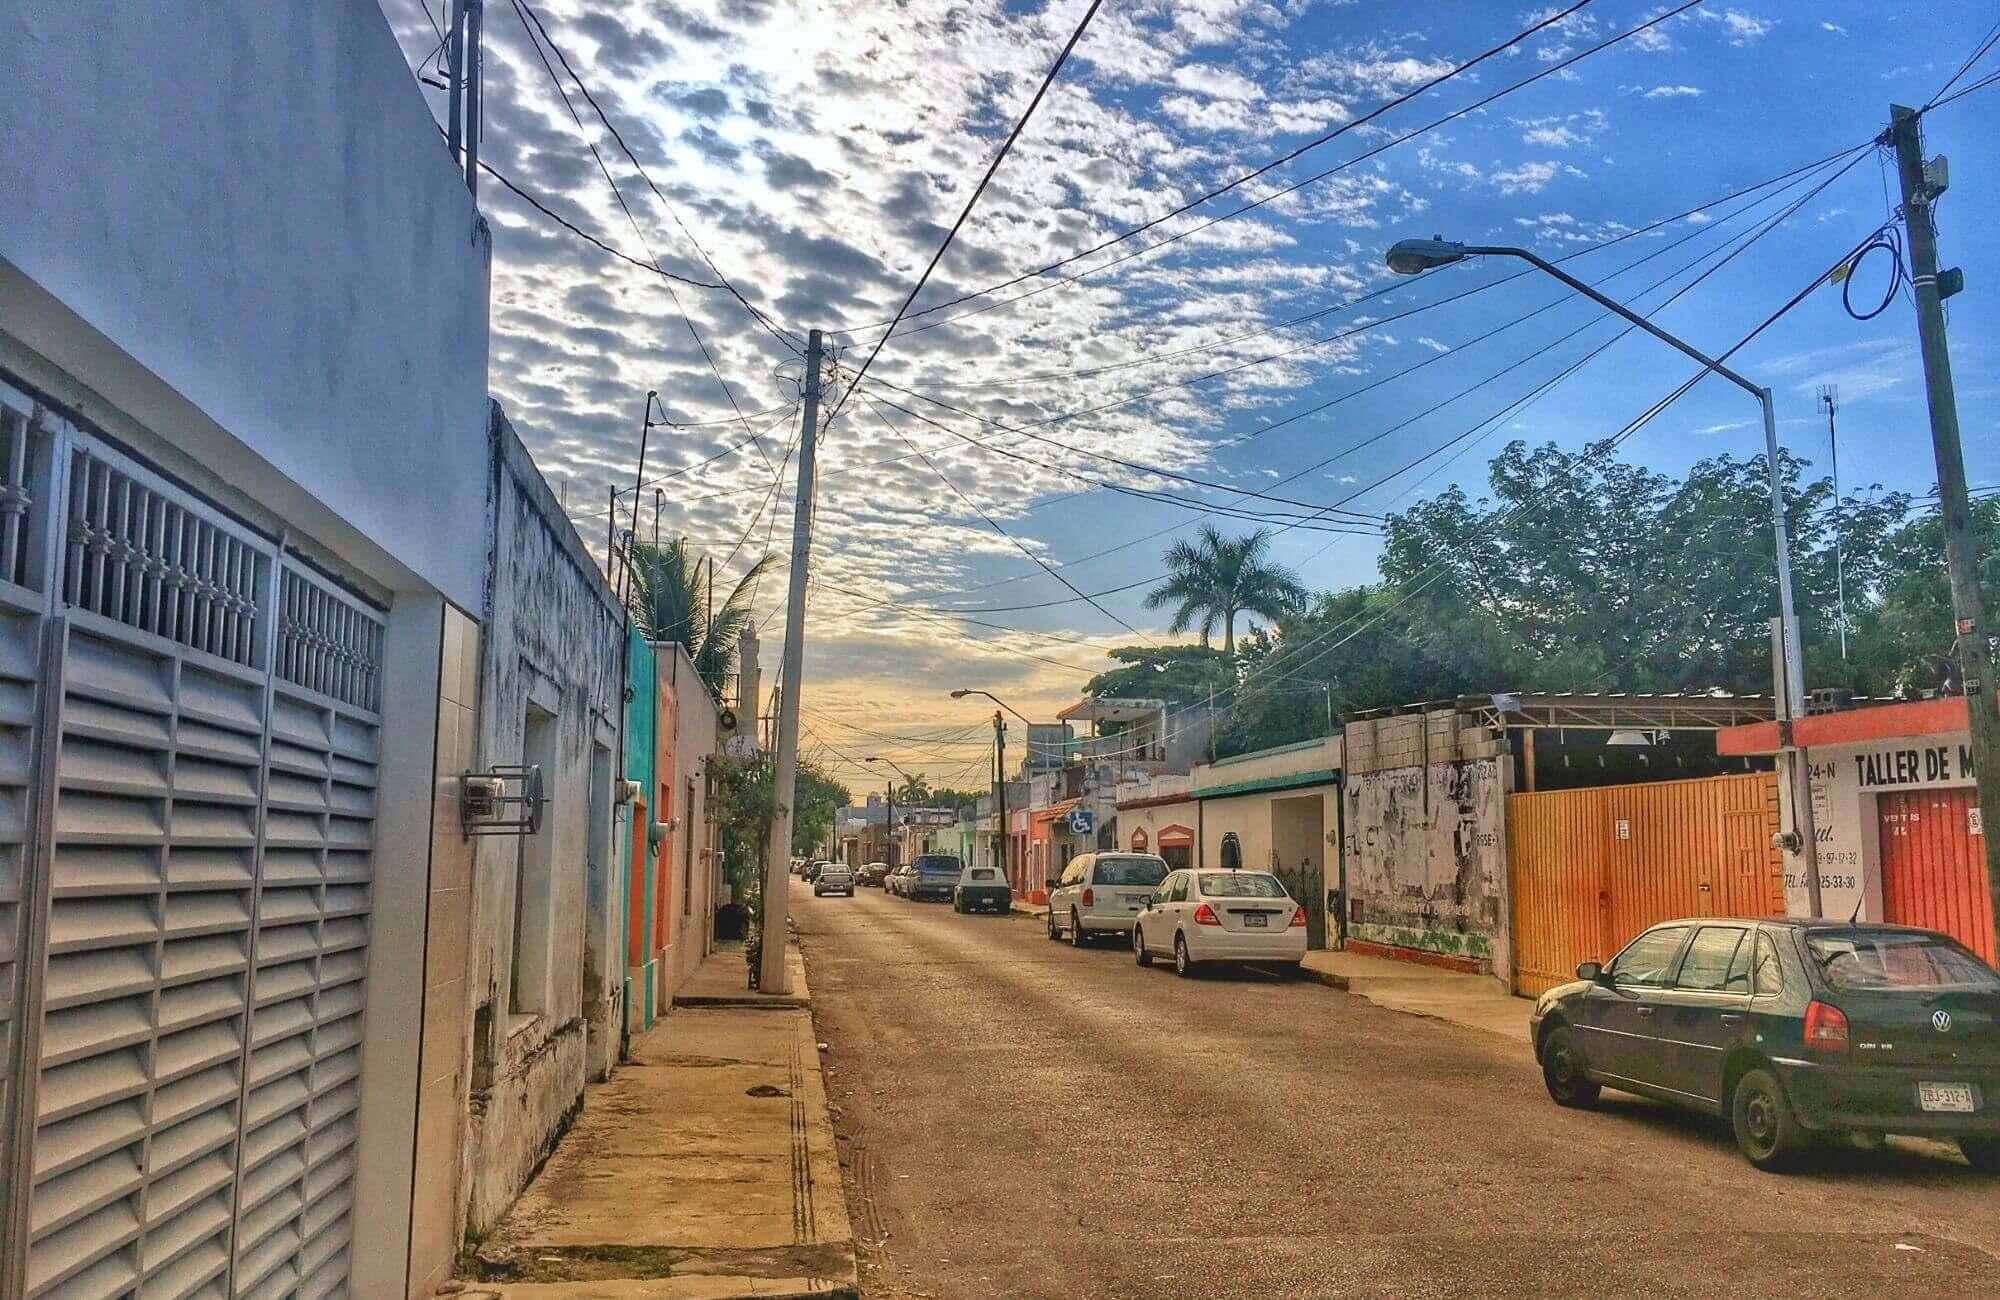 street in centro merida mexico